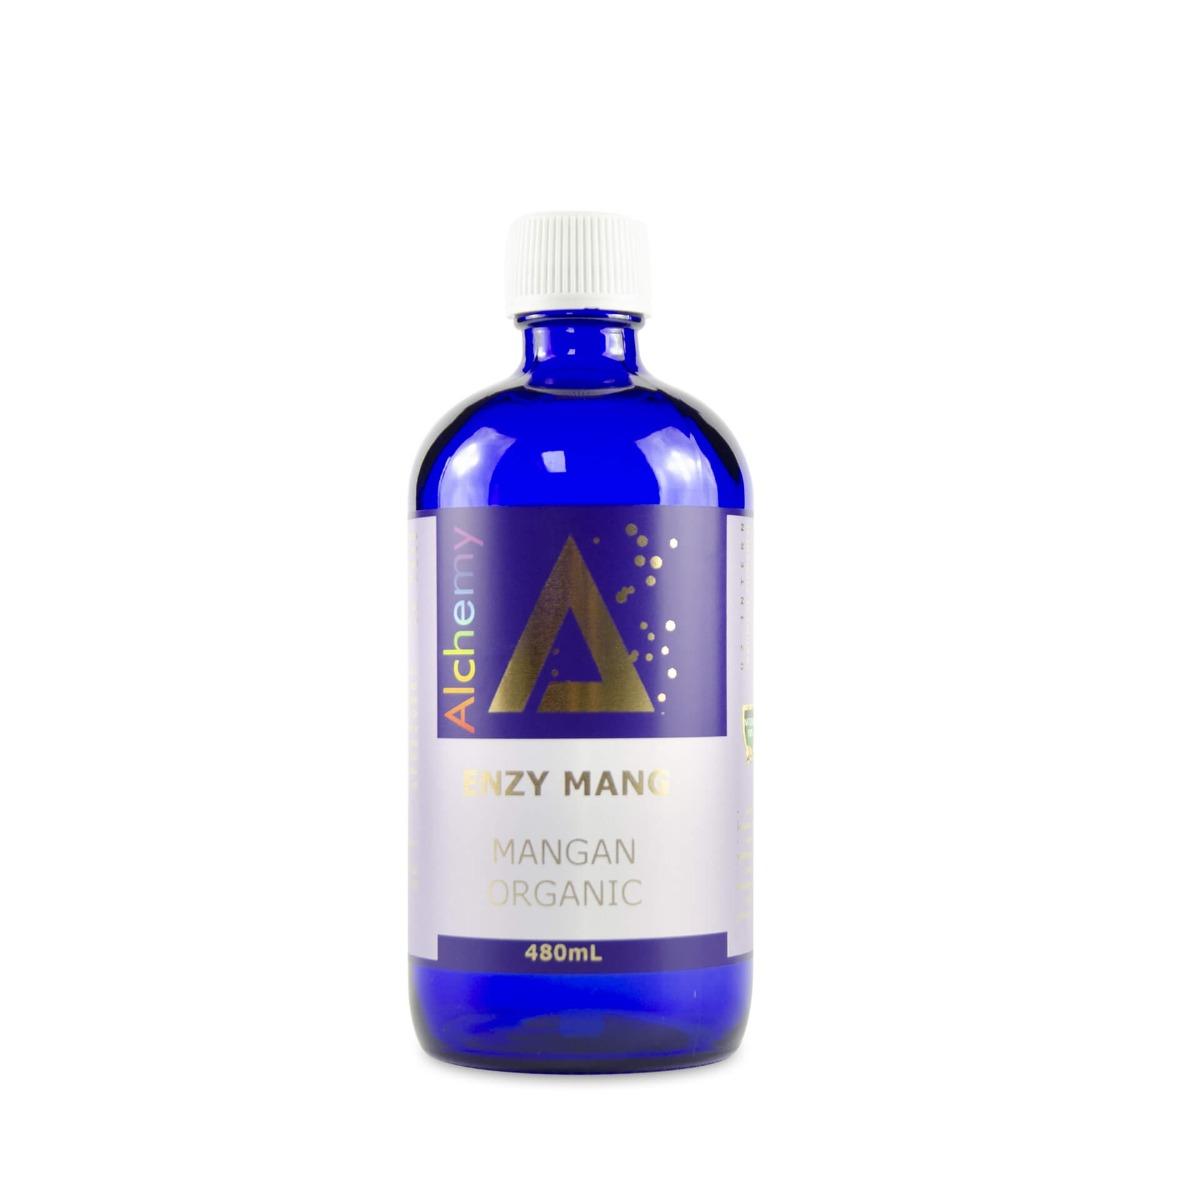 Enzy Mang Mangan Ionic Organic Alchemy, 480ml, Aghoras la preț mic imagine